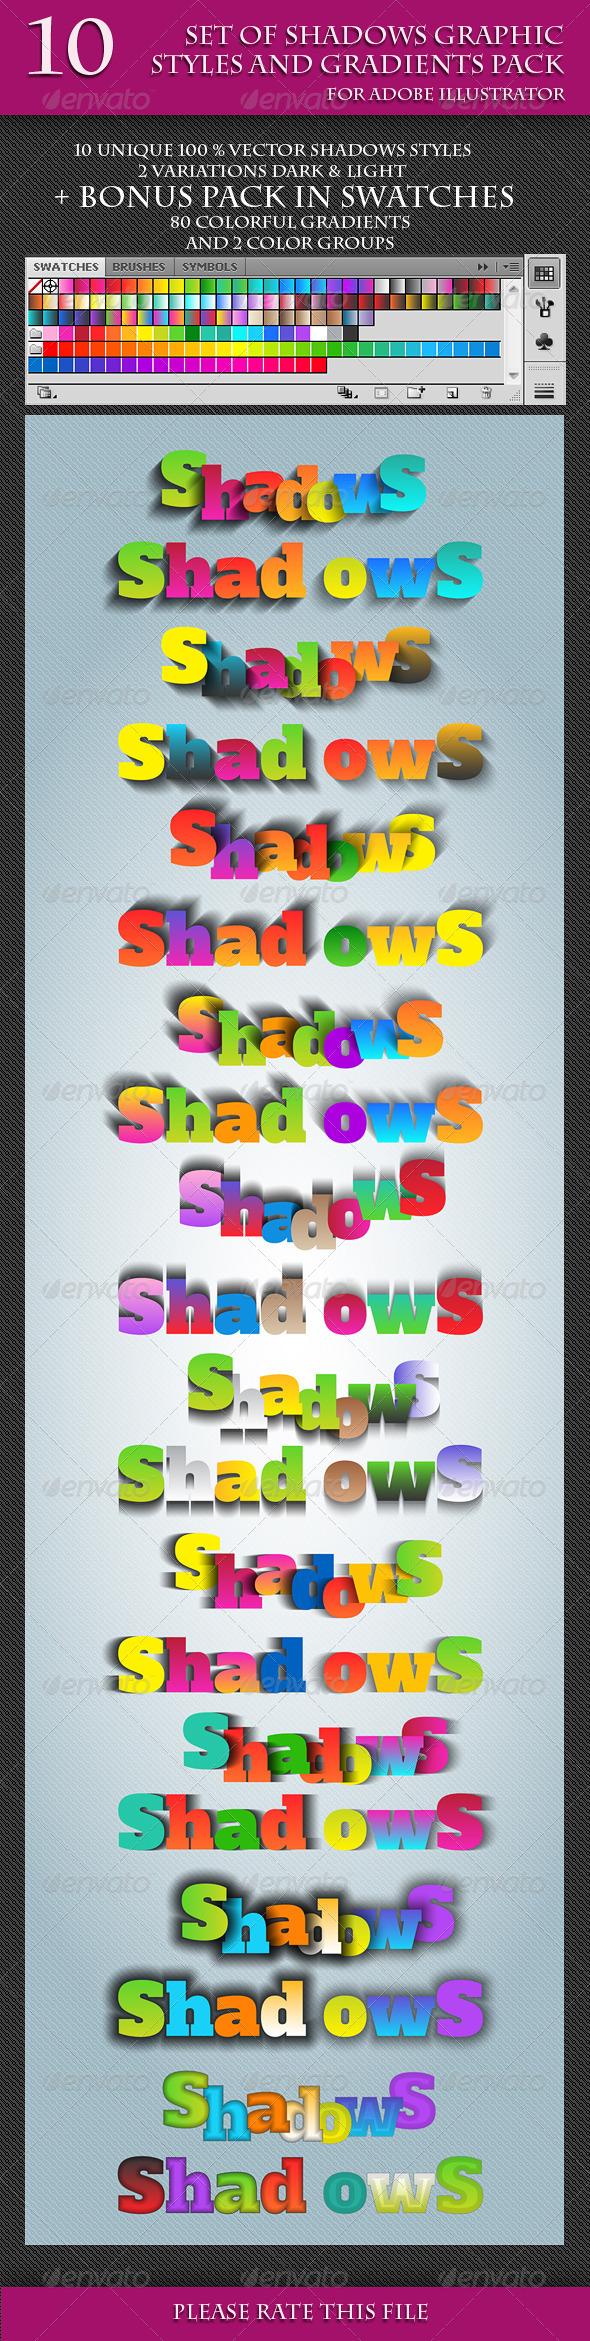 GraphicRiver Set of Unique Vector Shadows Graphic Styles 6916687